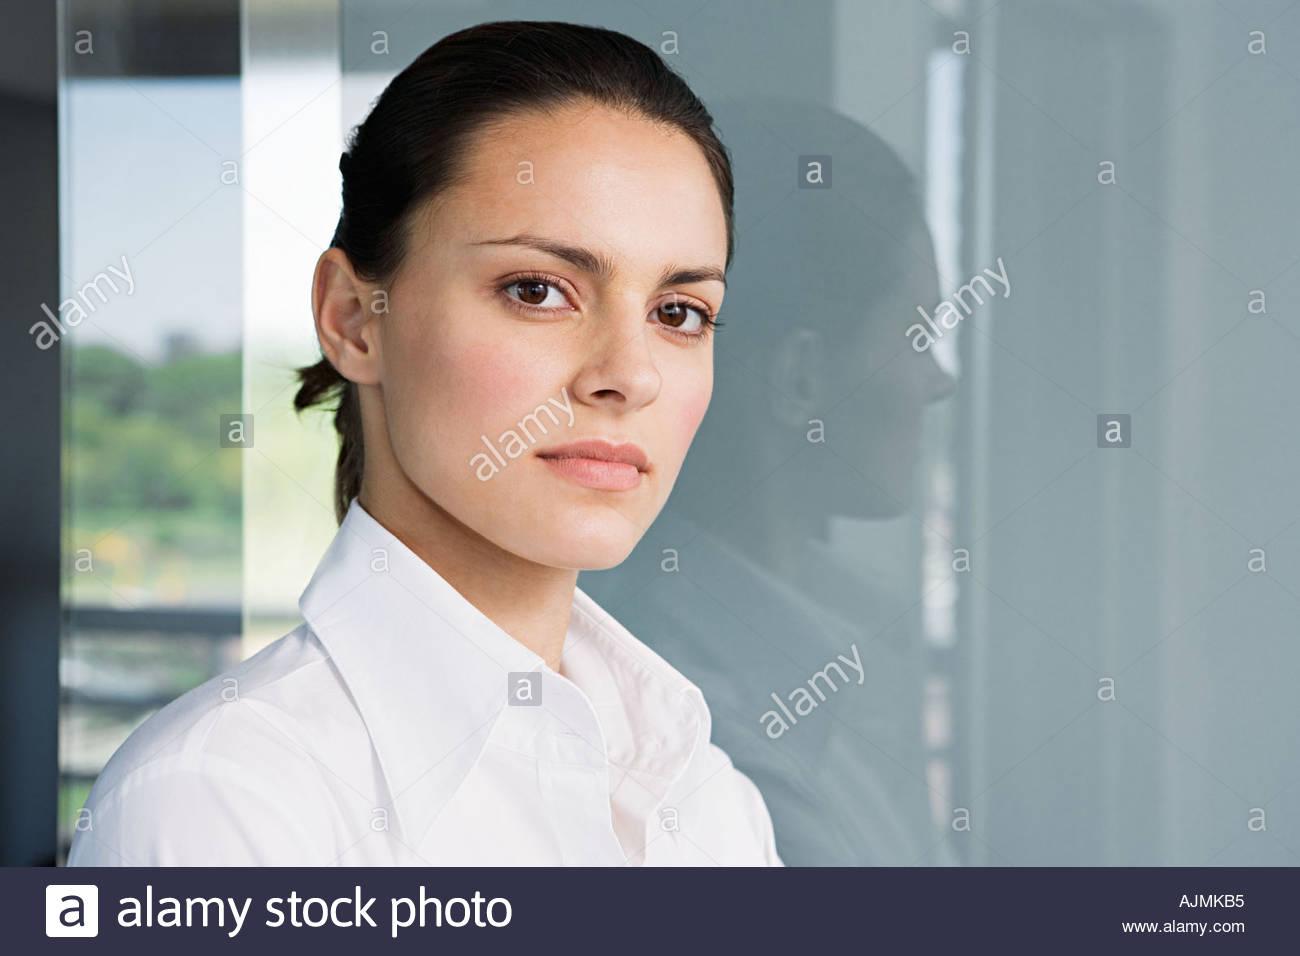 Mujer joven en una camisa blanca Imagen De Stock